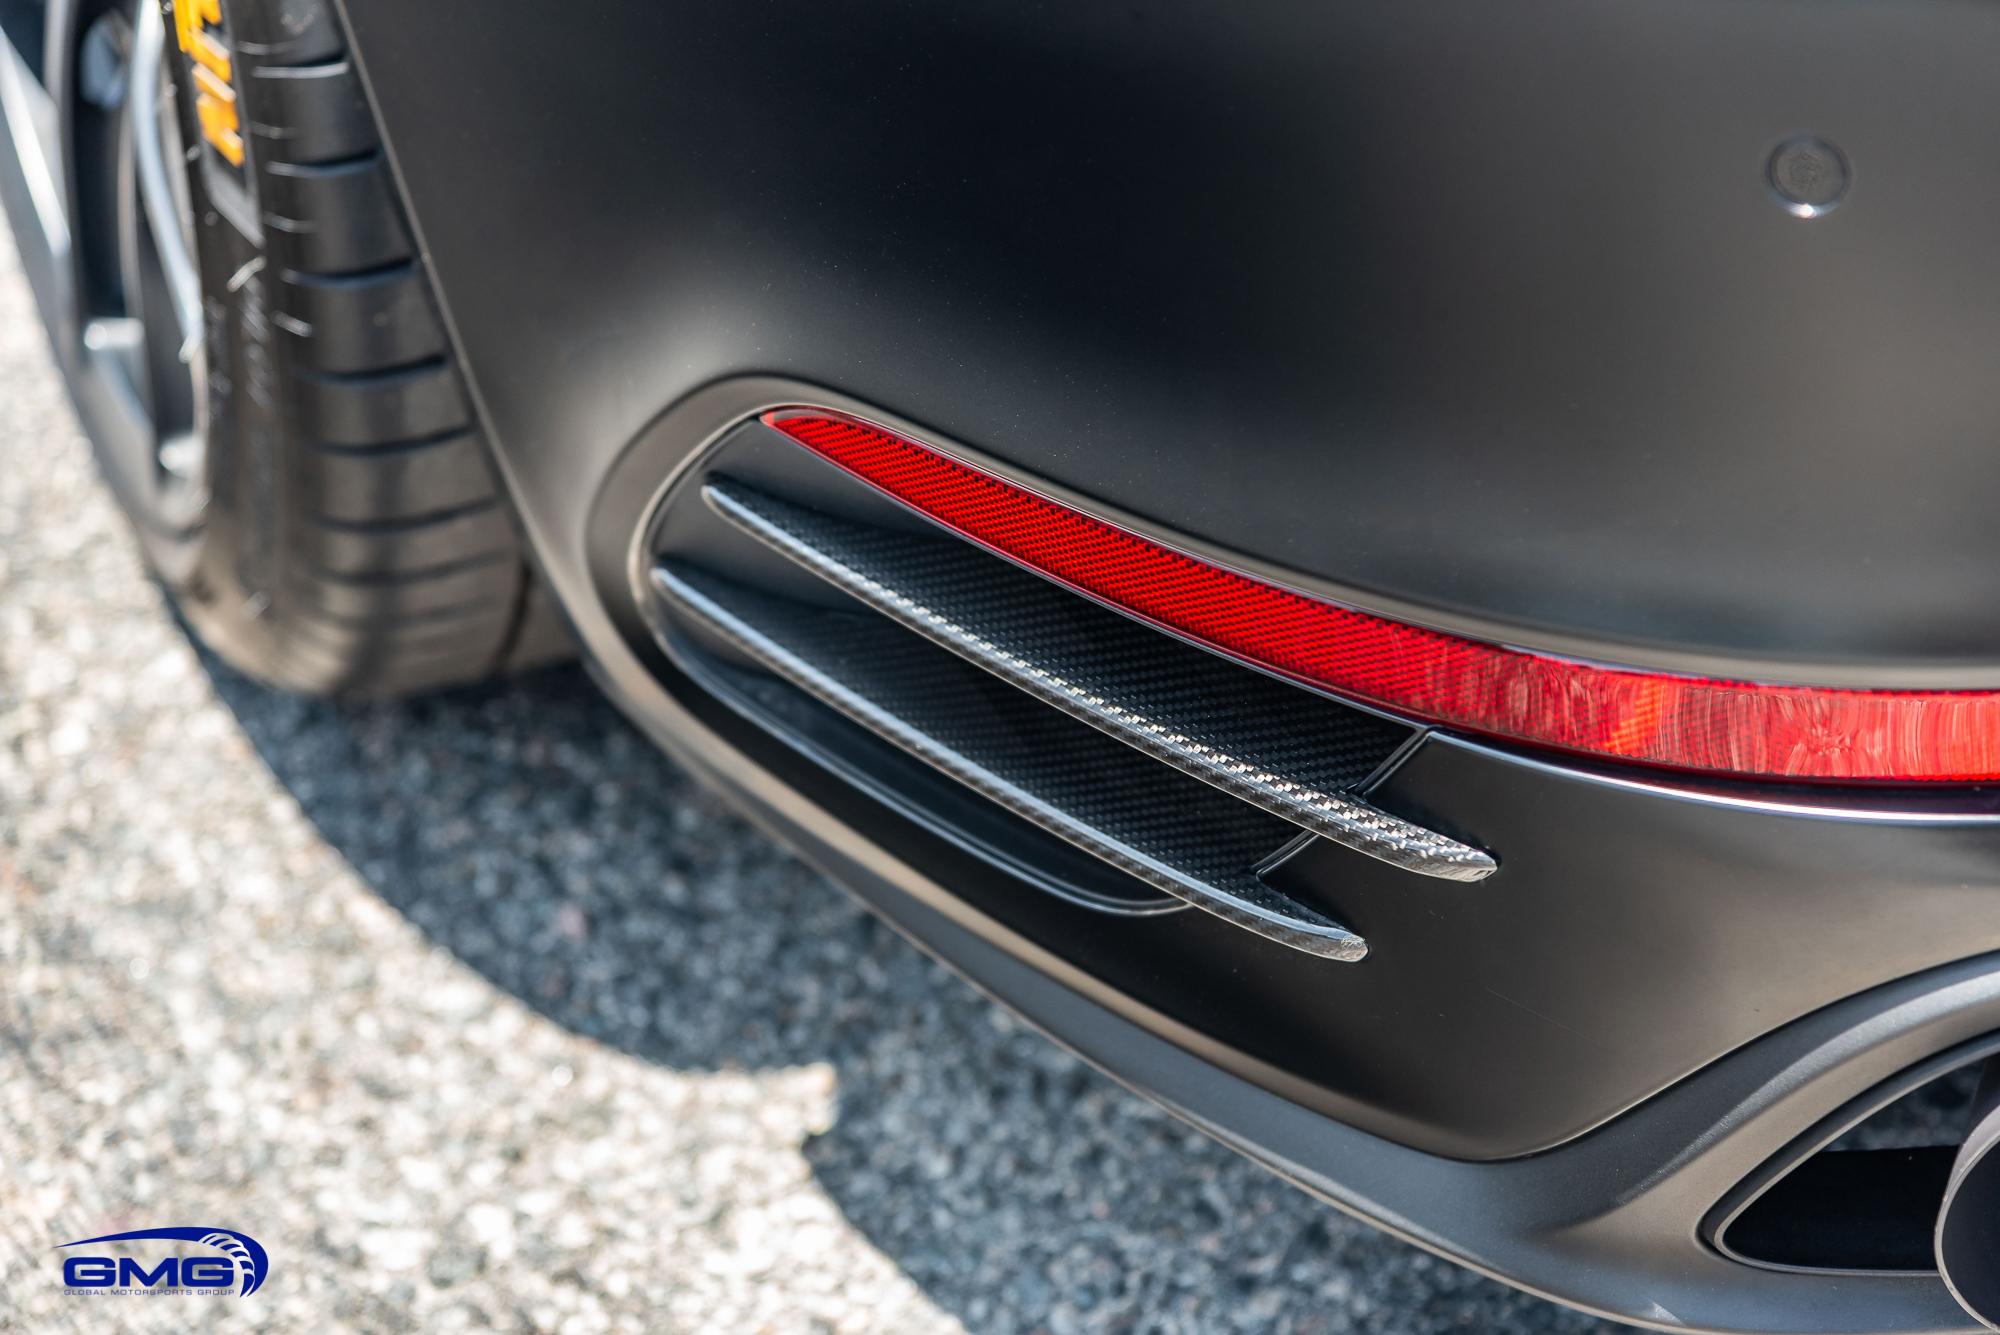 Stealth Porsche 991.2 WC-Turbo S